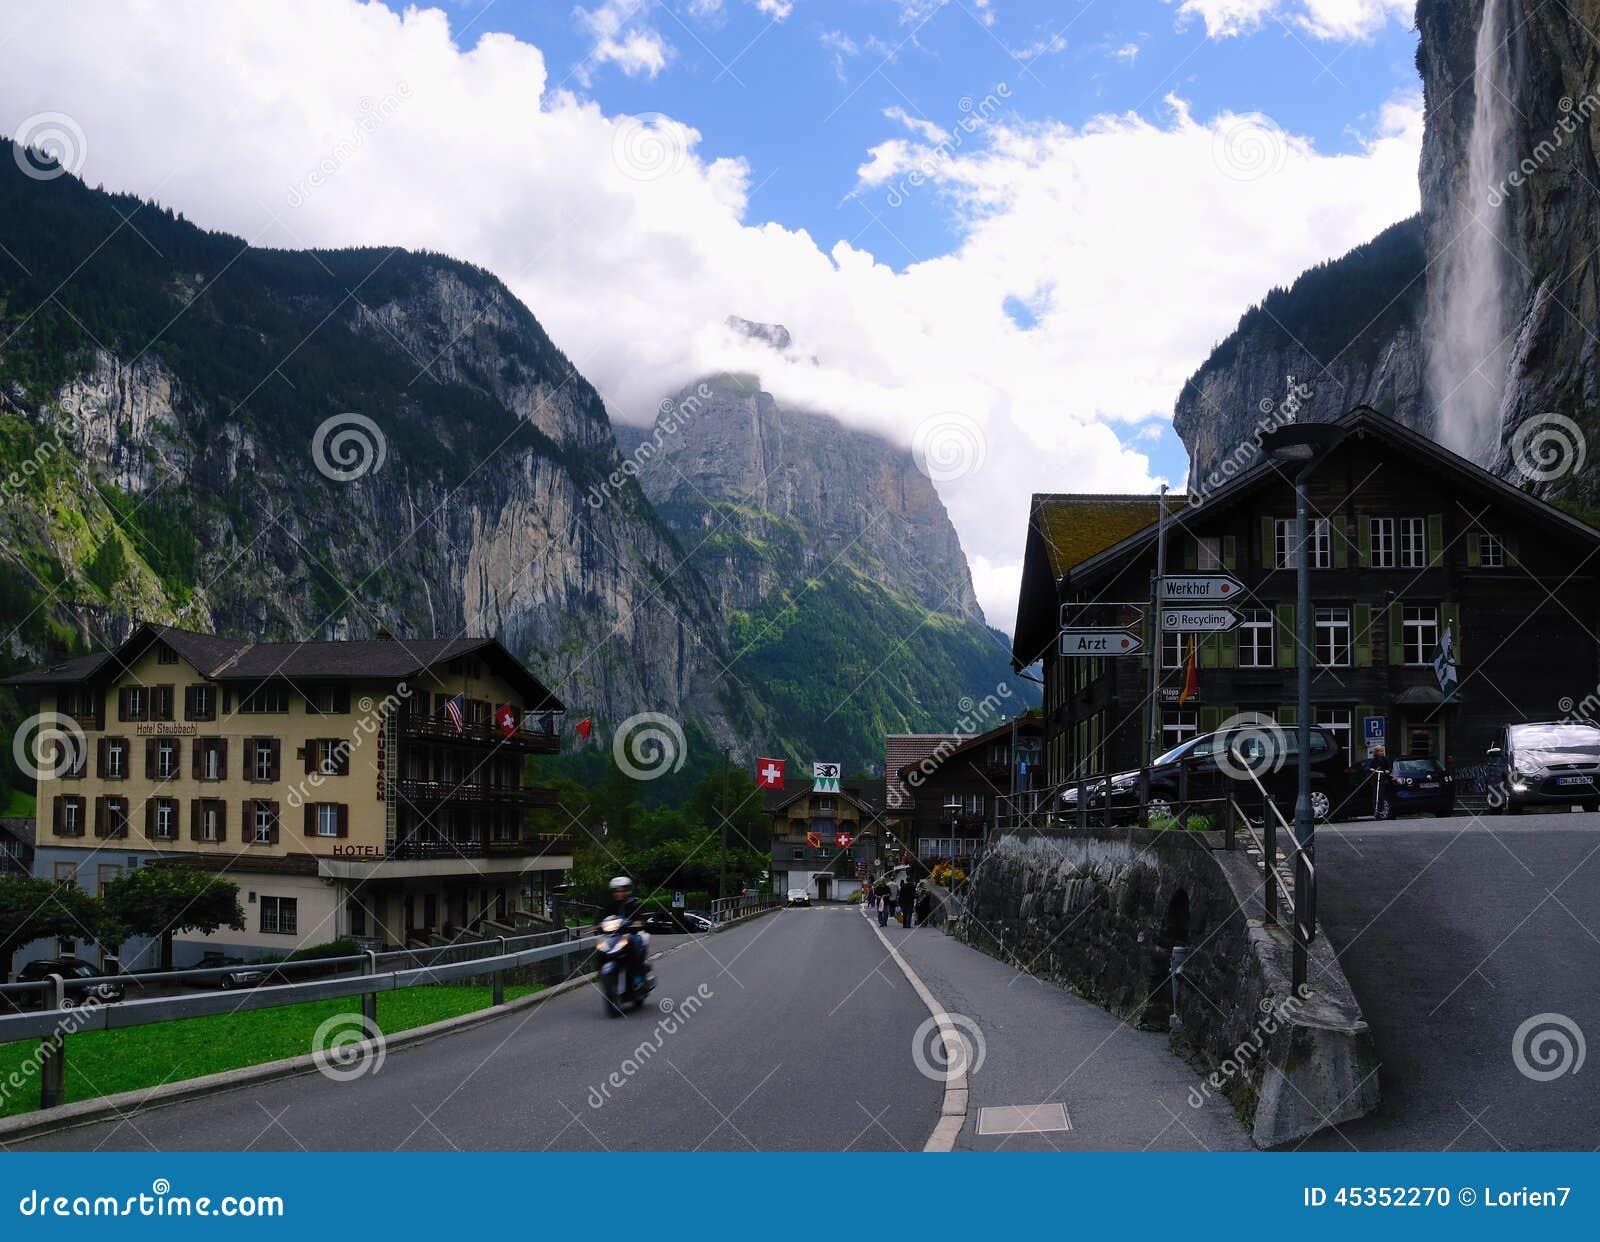 Village de Lauterbrunnen en vallée de Lauterbrunnen en Suisse